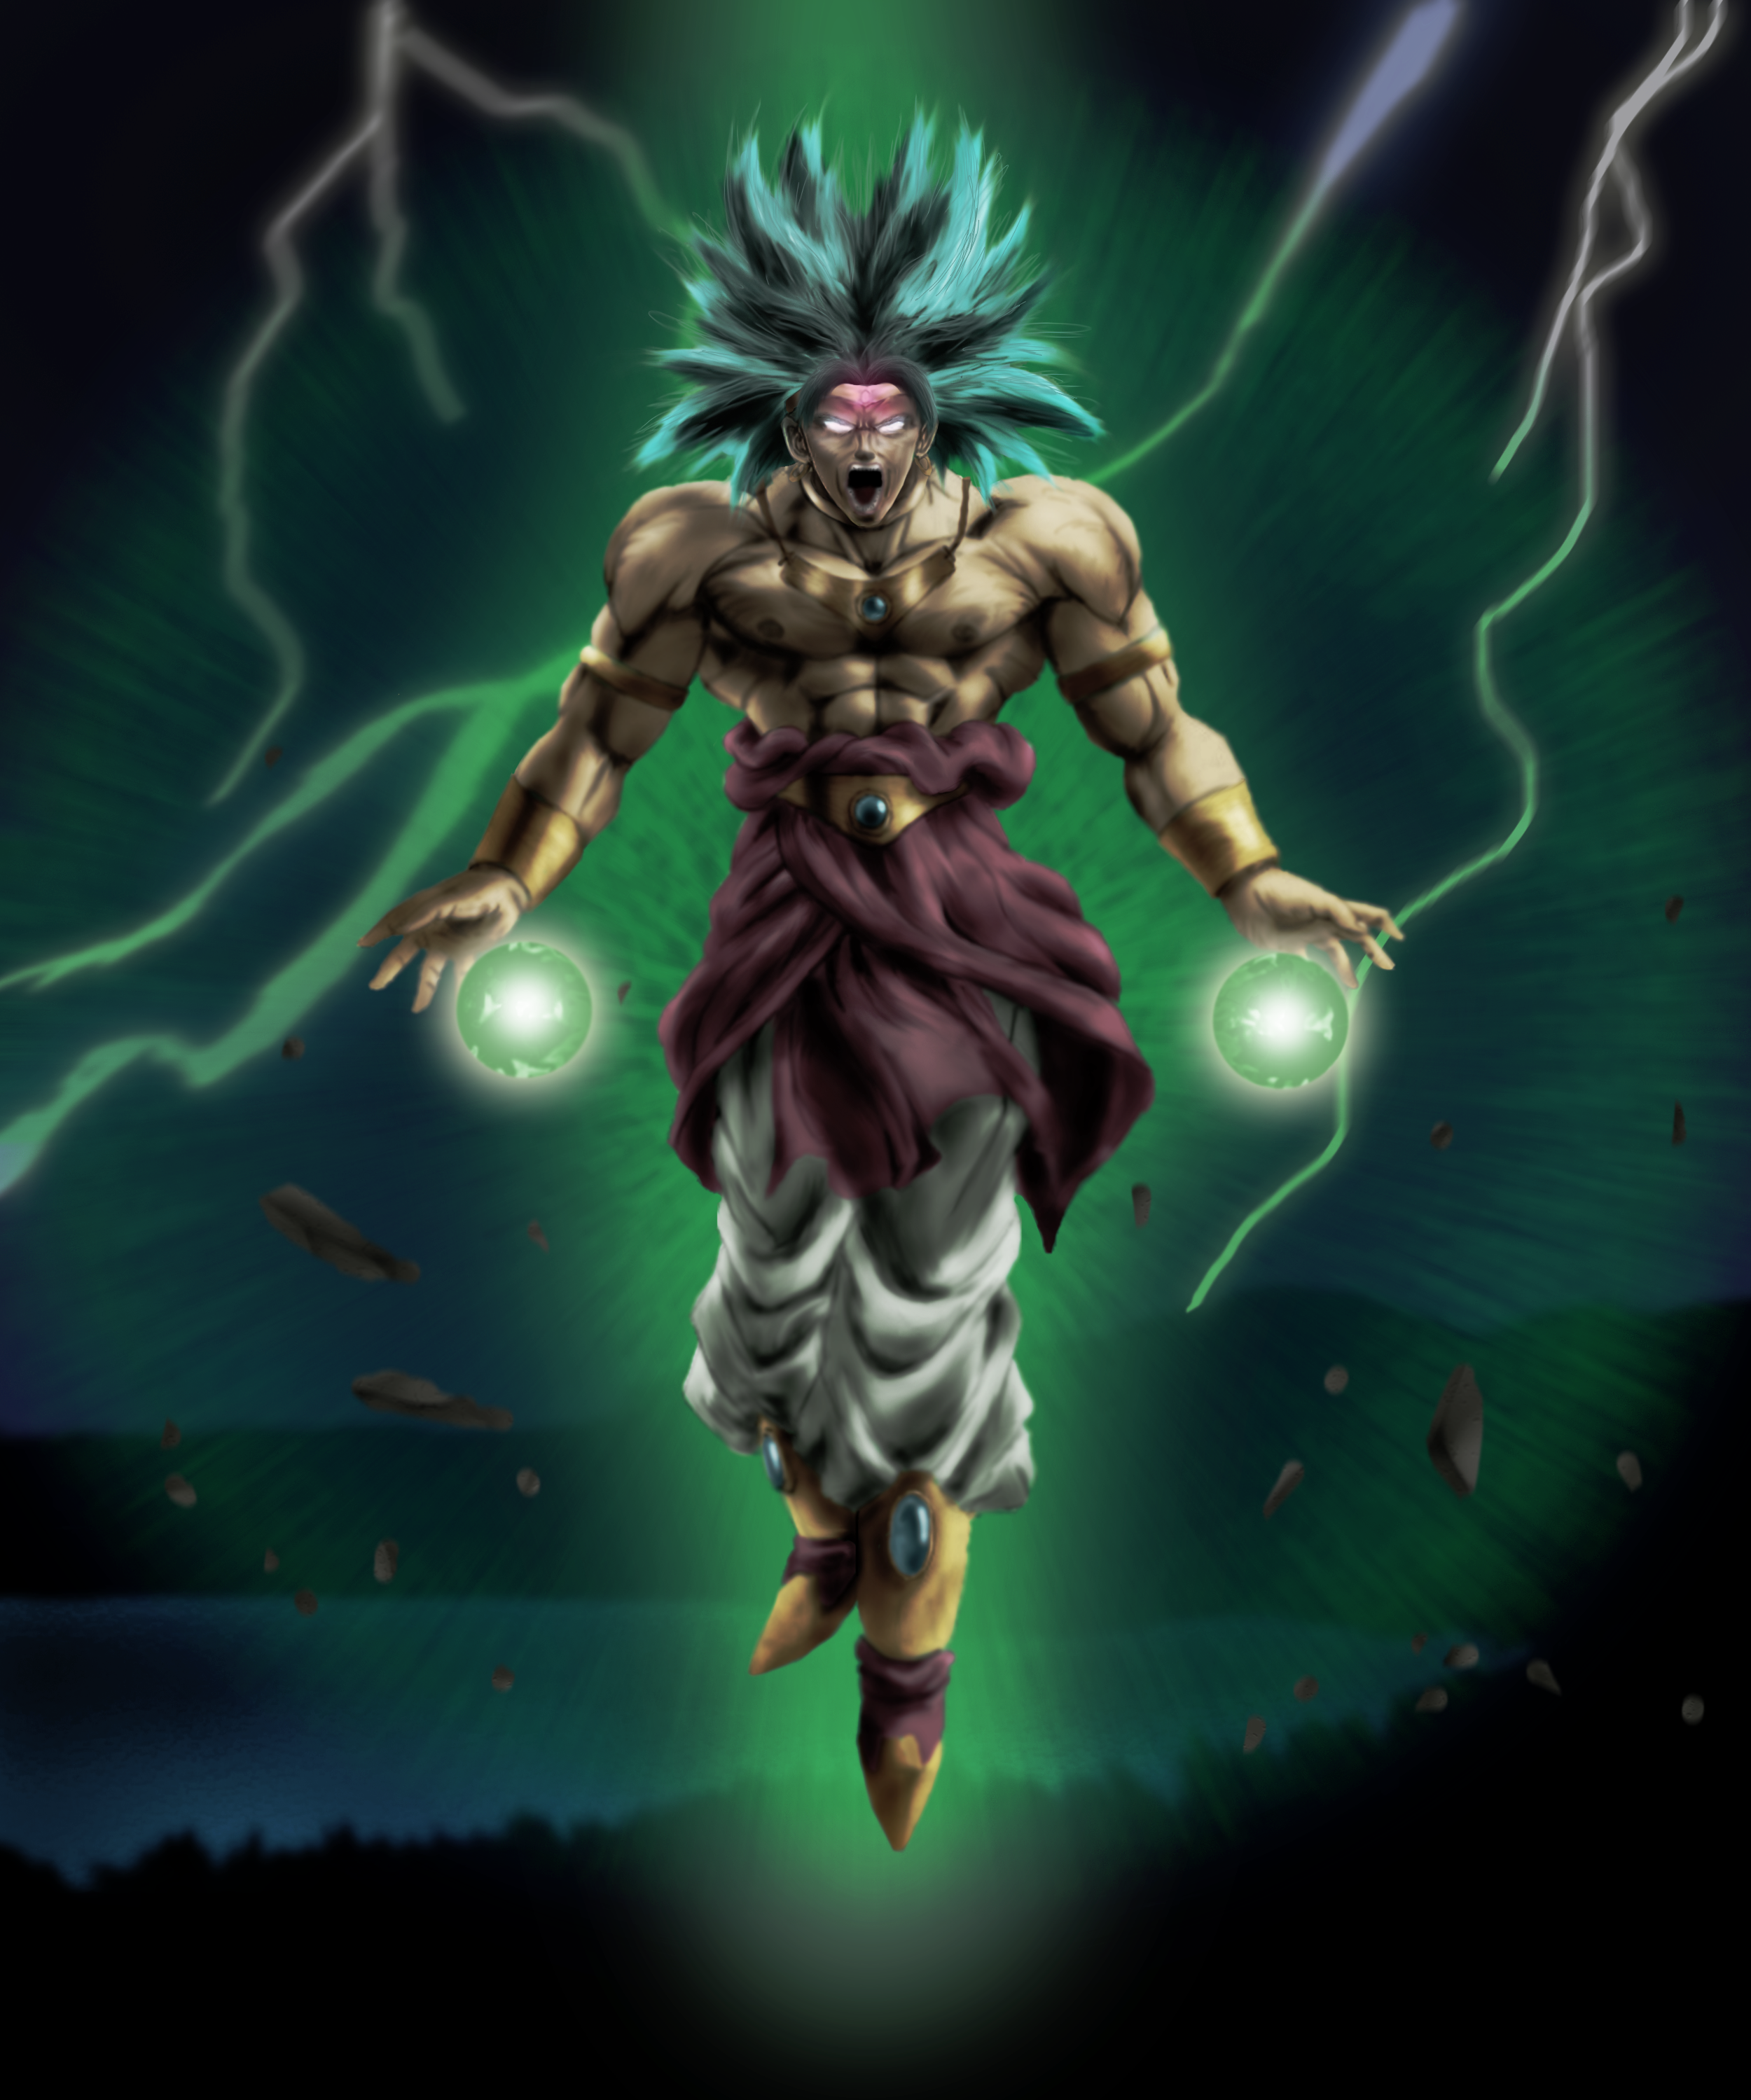 Broly Legendary Super Saiyan By Shibuz4 Deviantart Com On